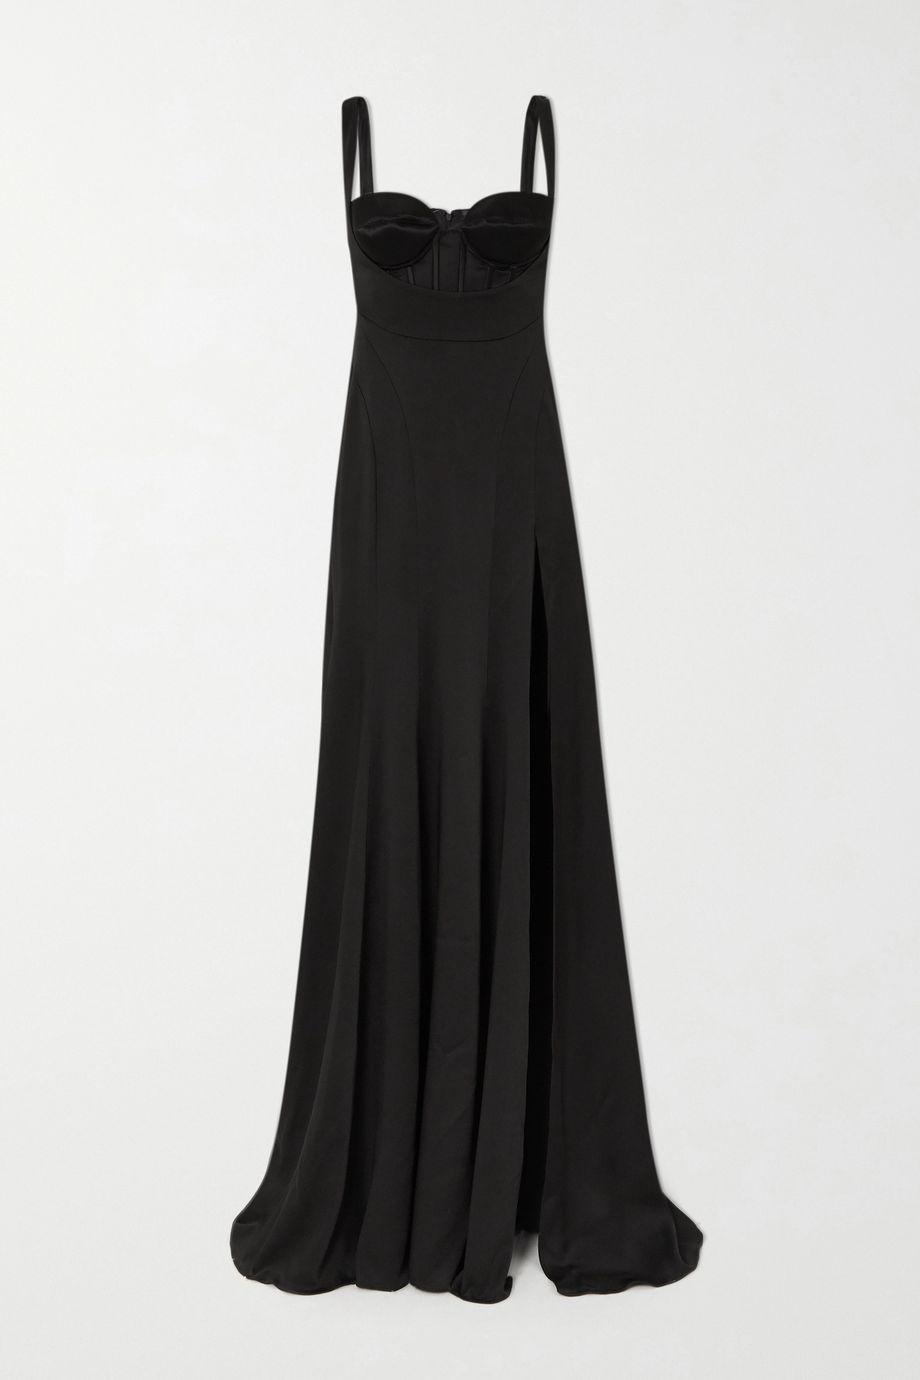 Mugler Satin maxi dress